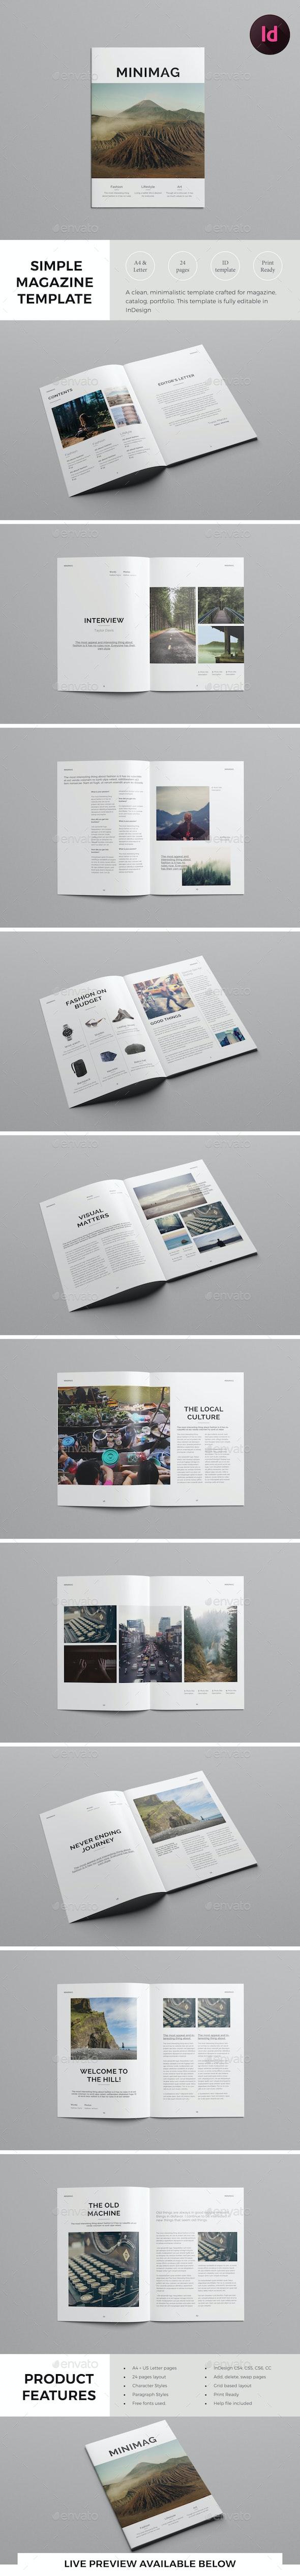 Simple Magazine Template - Magazines Print Templates